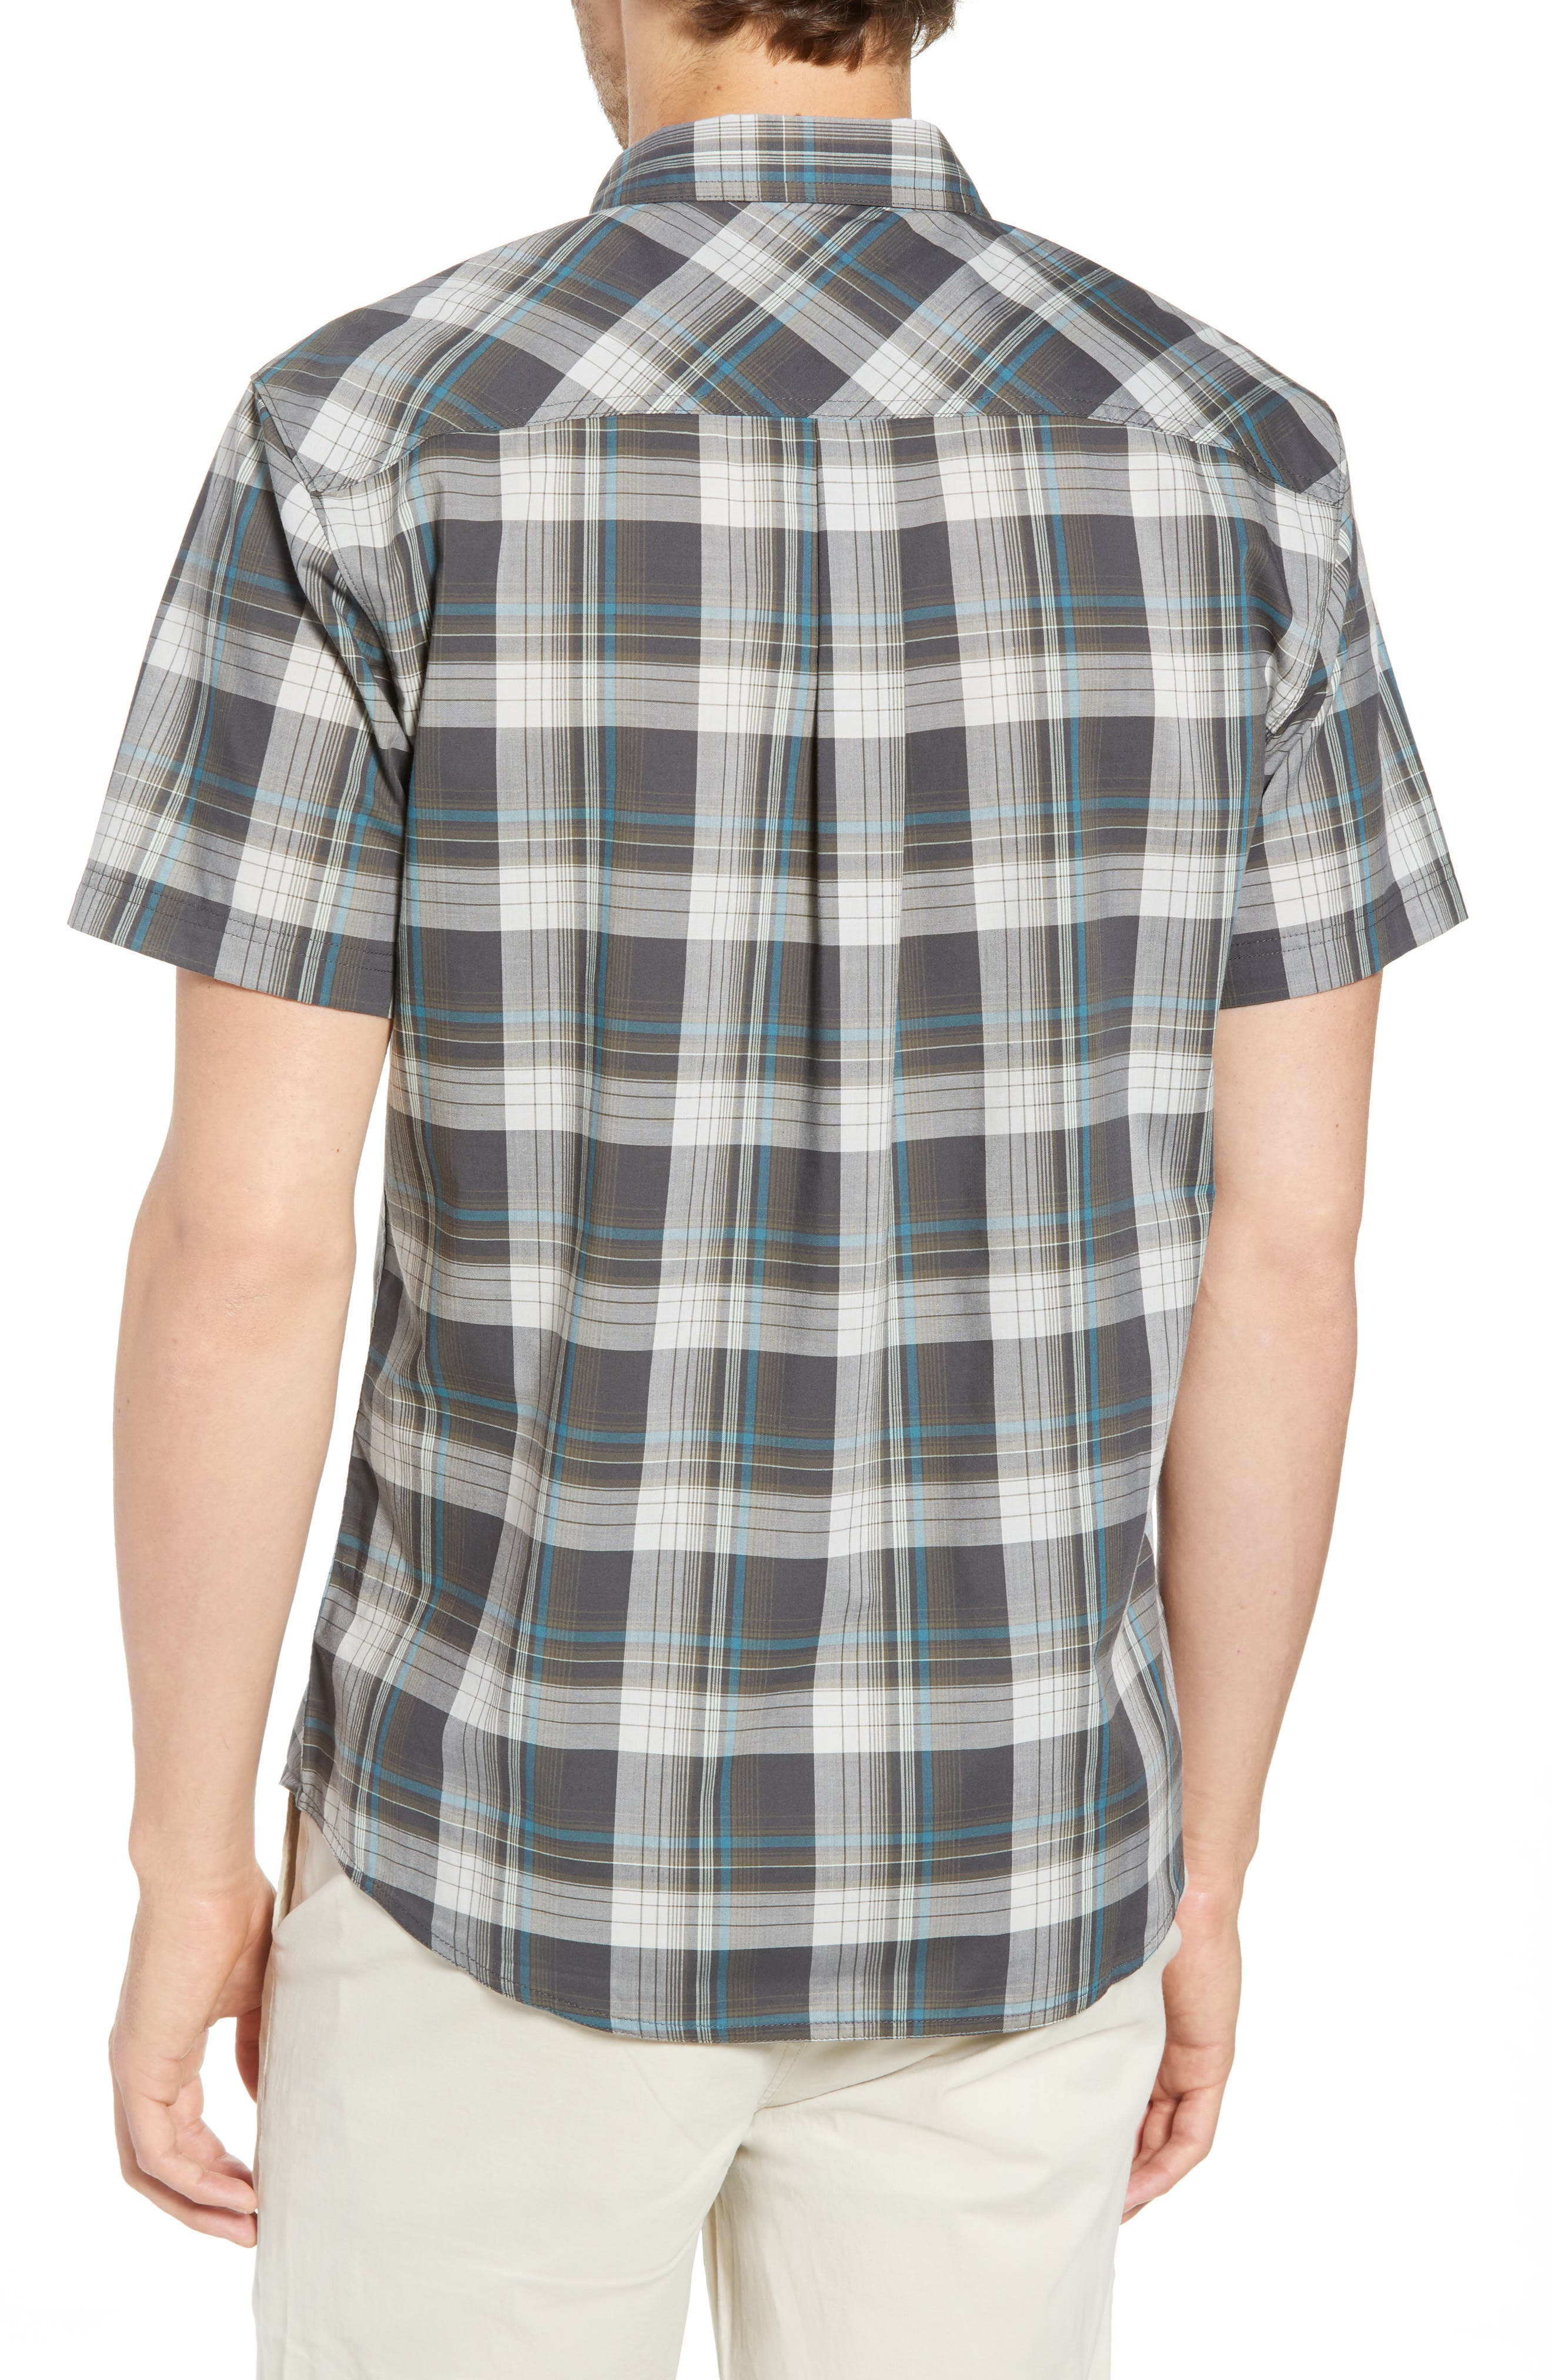 Gentry Short Sleeve Shirt,                             Alternate thumbnail 4, color,                             Asphalt